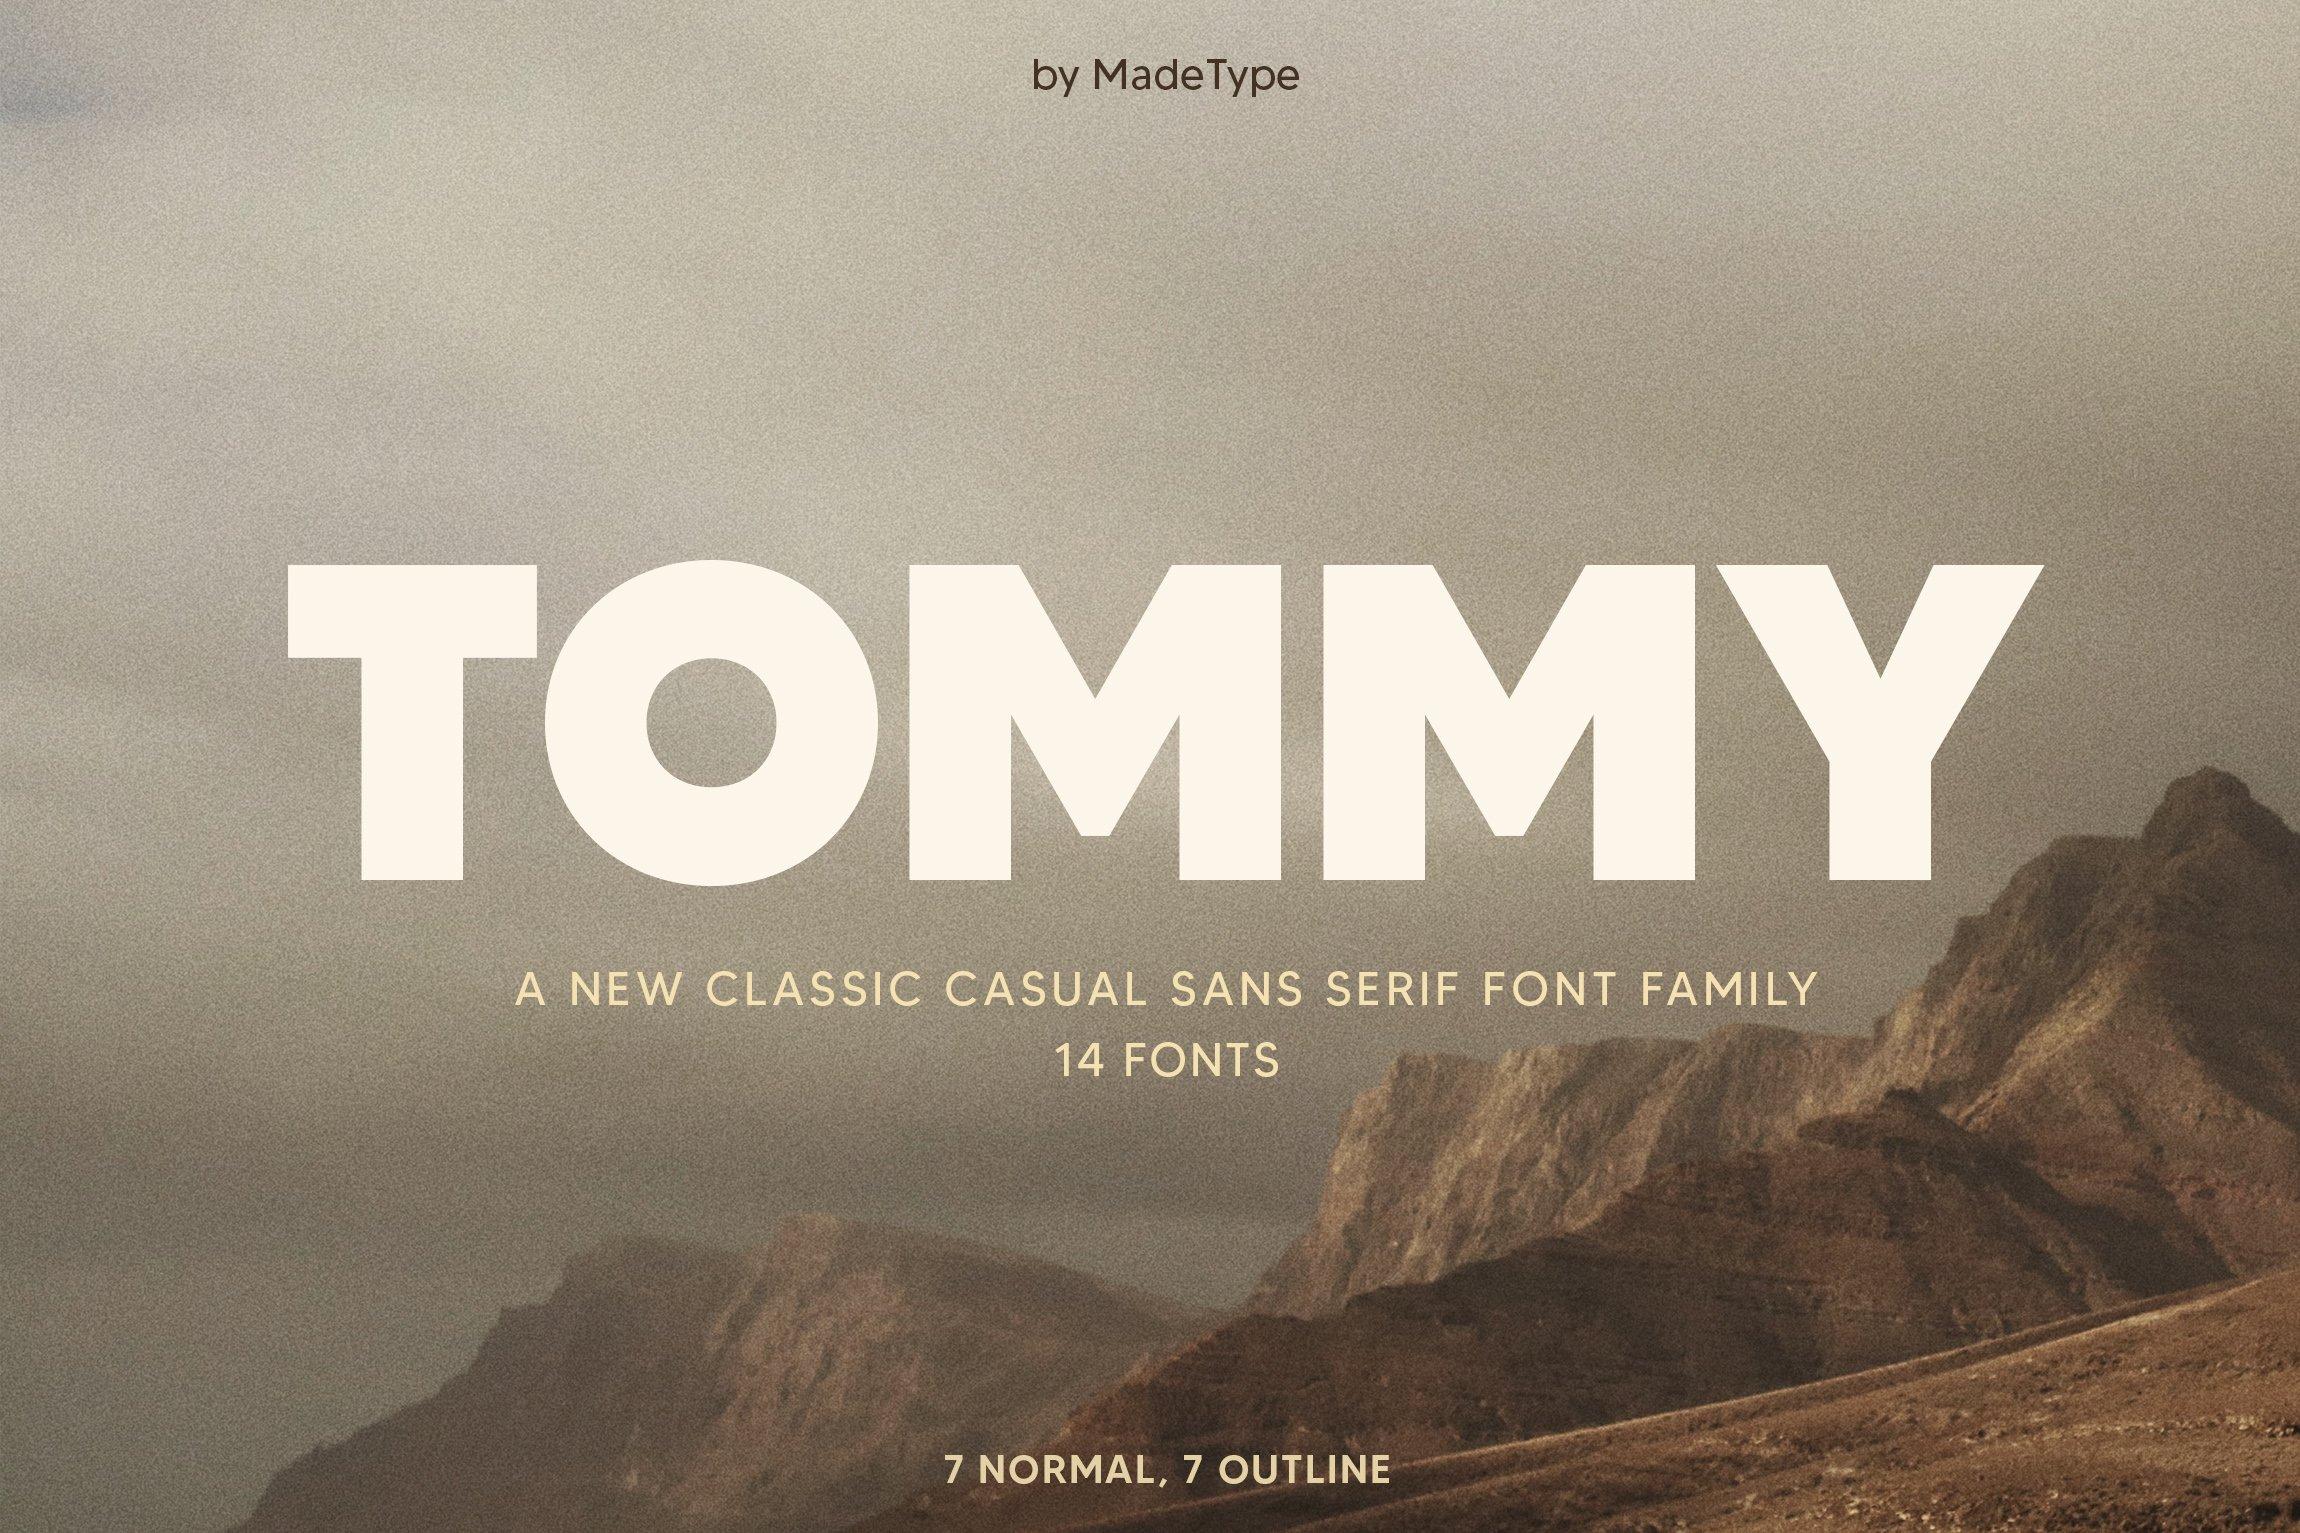 TOMMY-Sans-Serif-Font-www.mockuphill.com